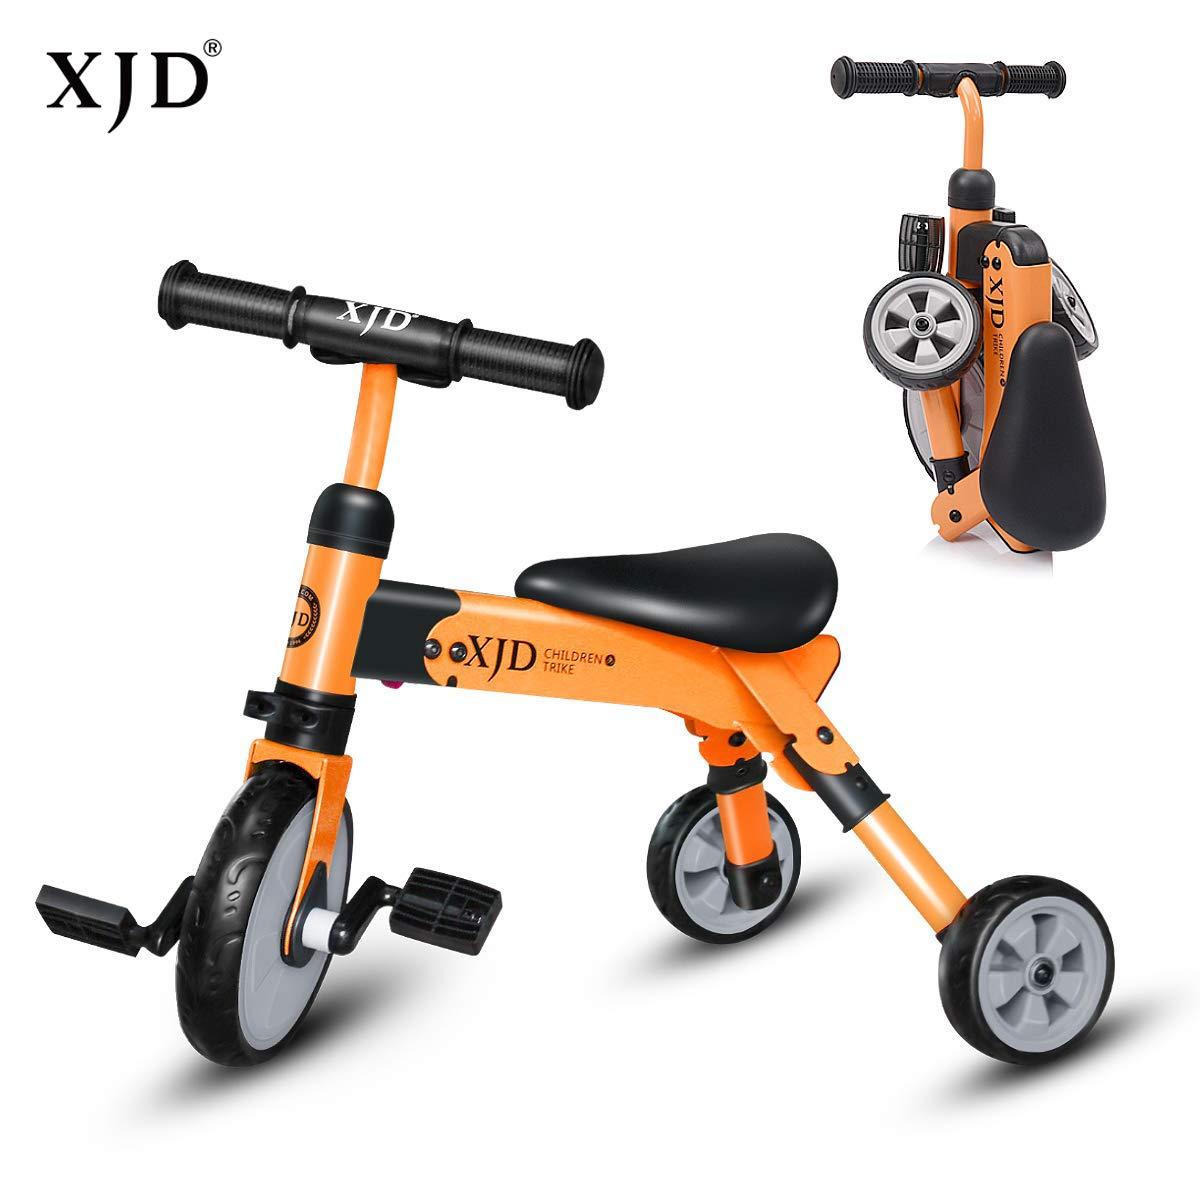 XJD 2 2 B078S6G6PY XJD in 1幼児トライクベビー三輪車ベビーバランスバイクキャリーバッグ軽量折りたたみトライクおもちゃに乗る年齢24歳の男の子女の子(オレンジ) B078S6G6PY, フルーツショップ千馬:4e4f5c4d --- number-directory.top